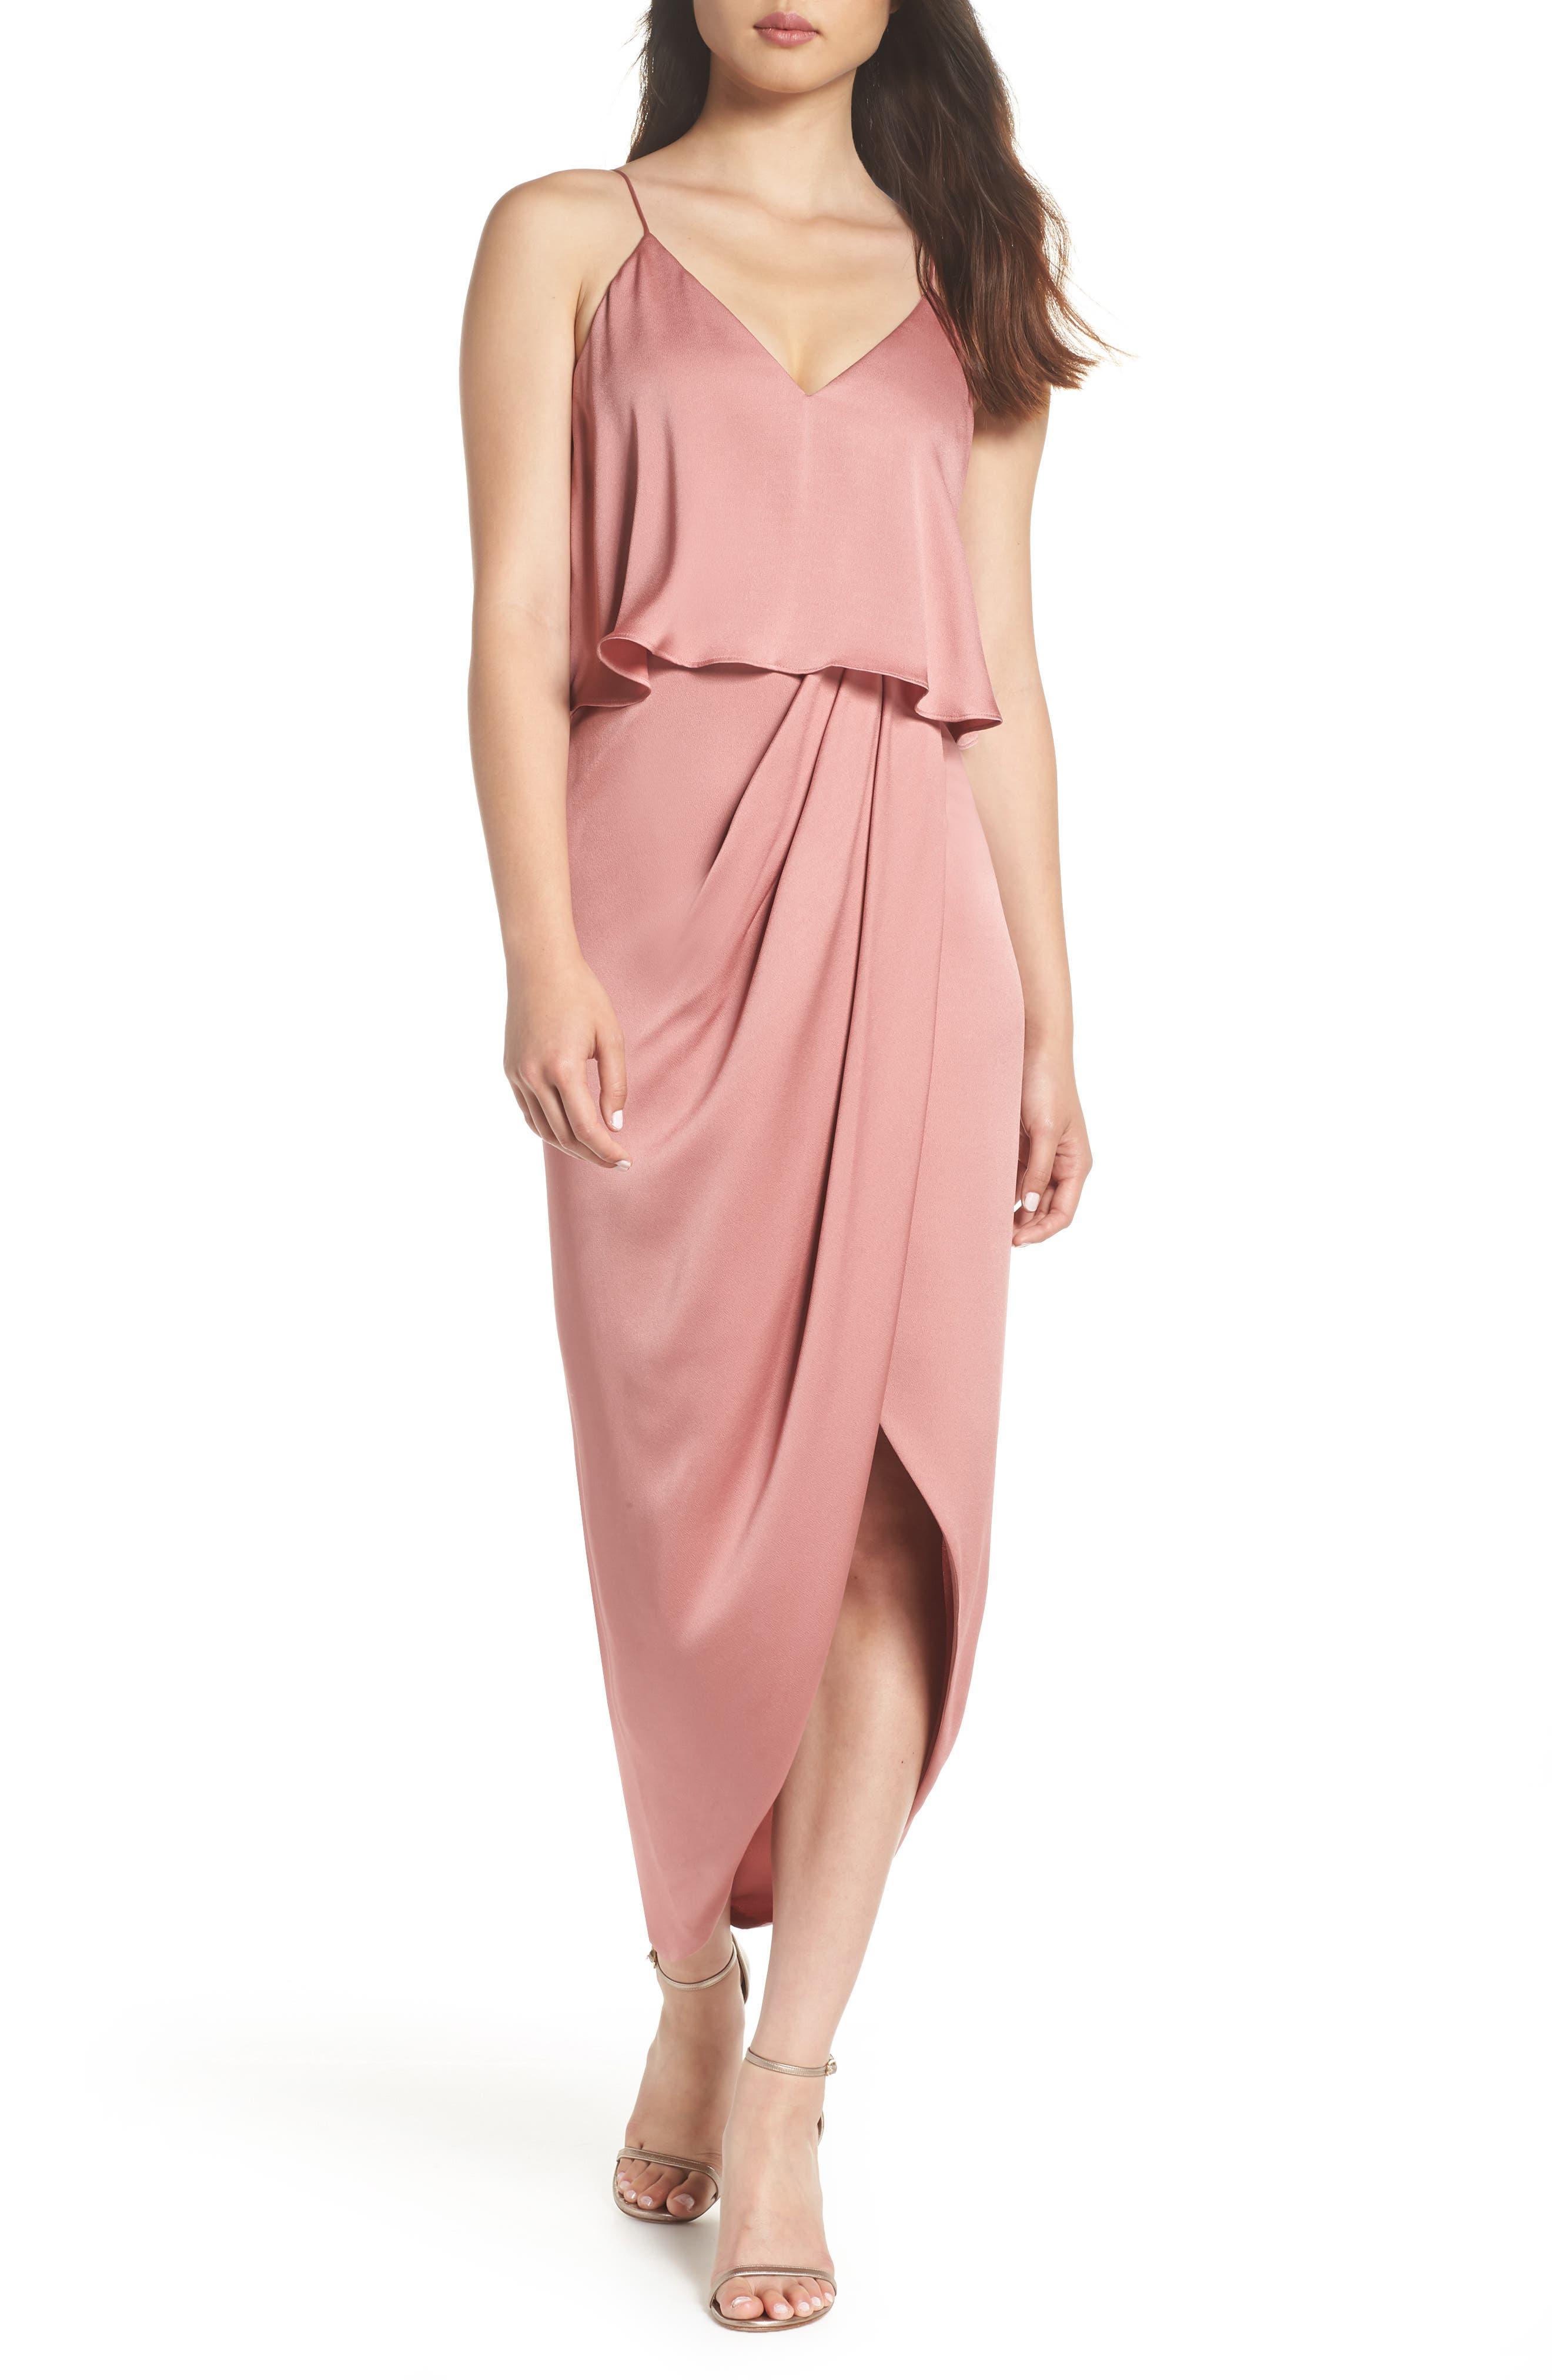 Shona Joy Luxe Frill Tulip Hem Maxi Dress, Pink